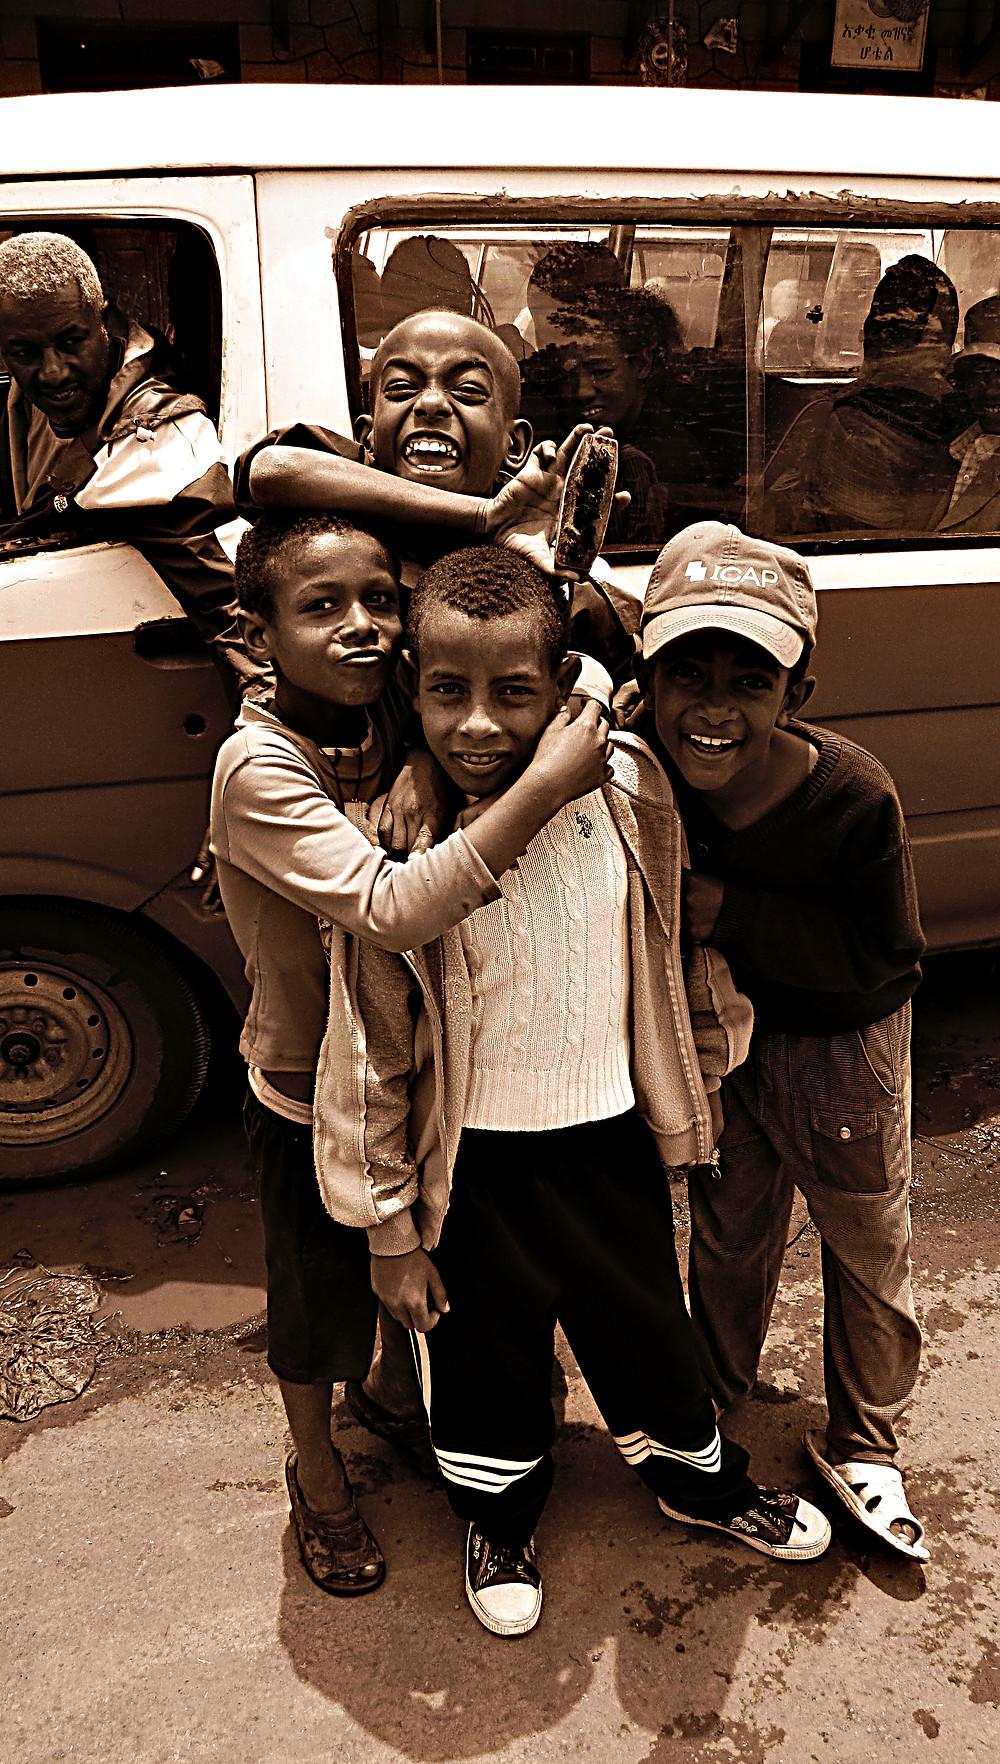 Street kids, Addis Ababa, Ethiopia